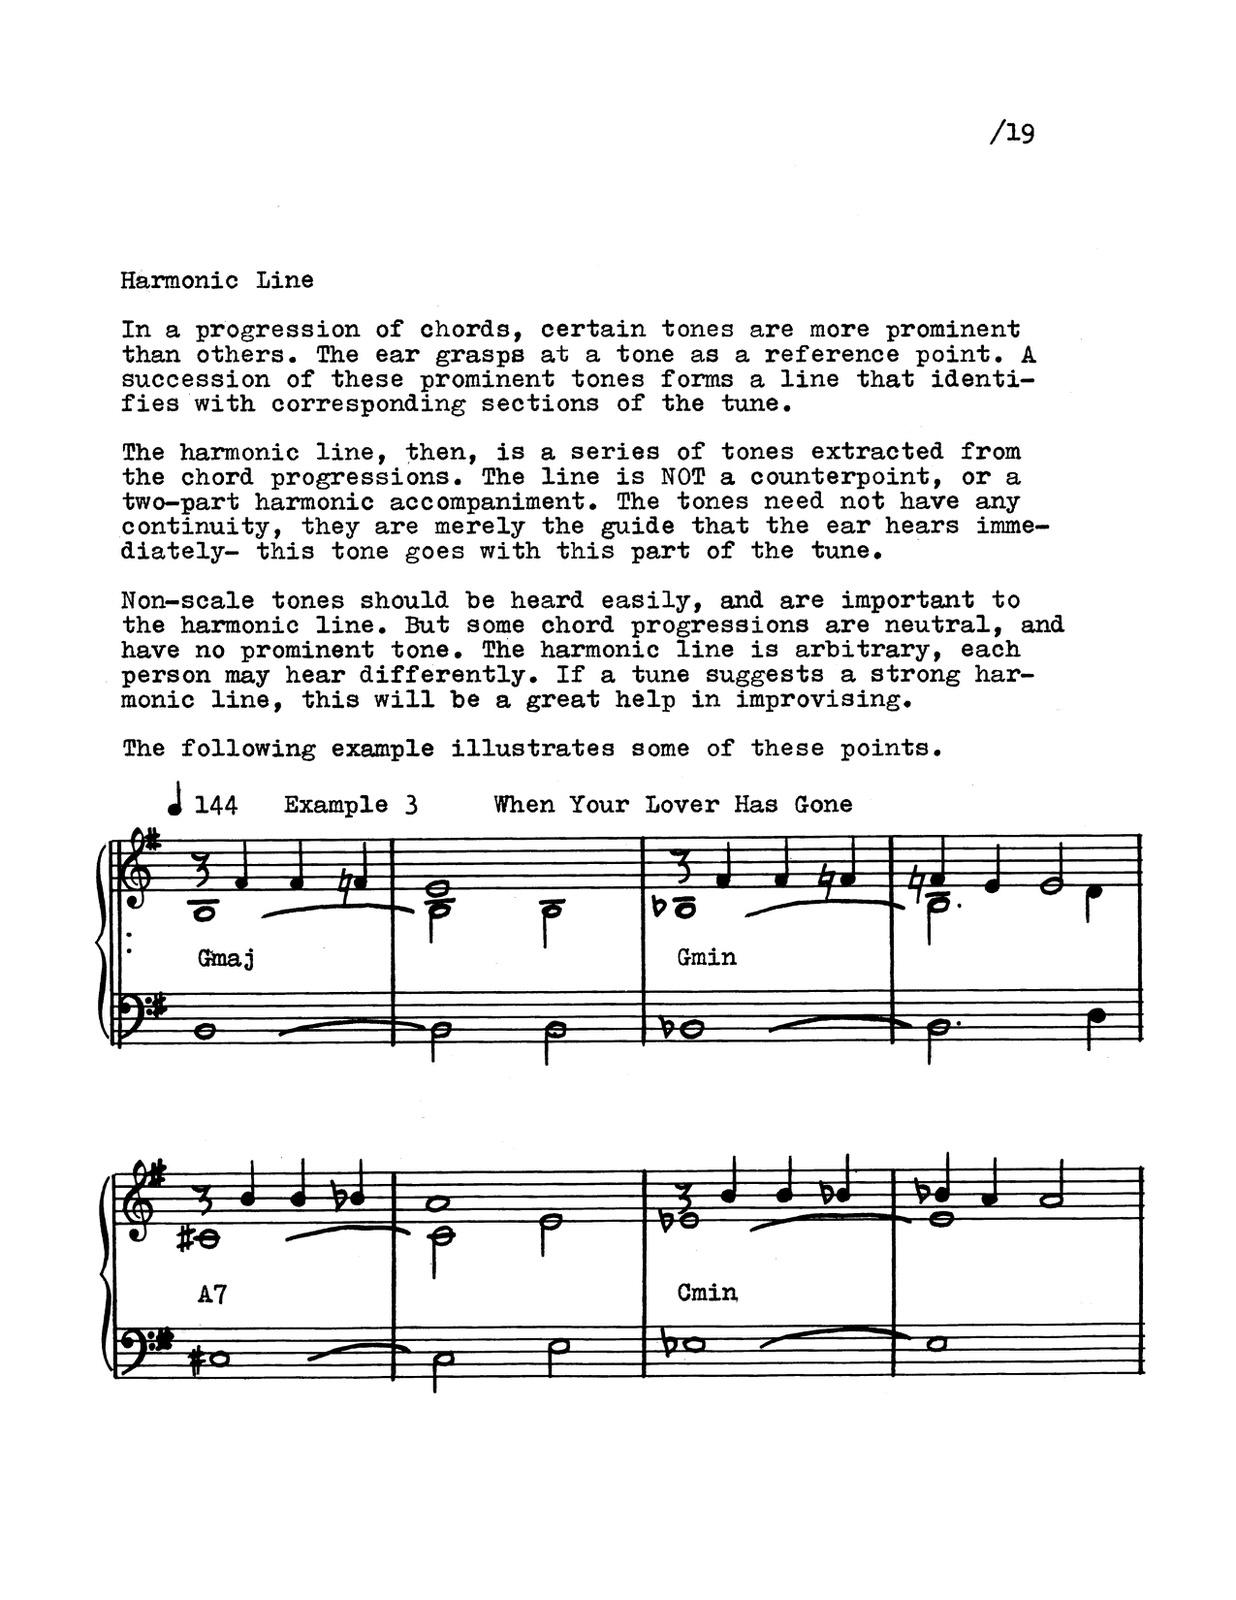 Sandole, The Craft of Jazz 1, Apprentice-p019